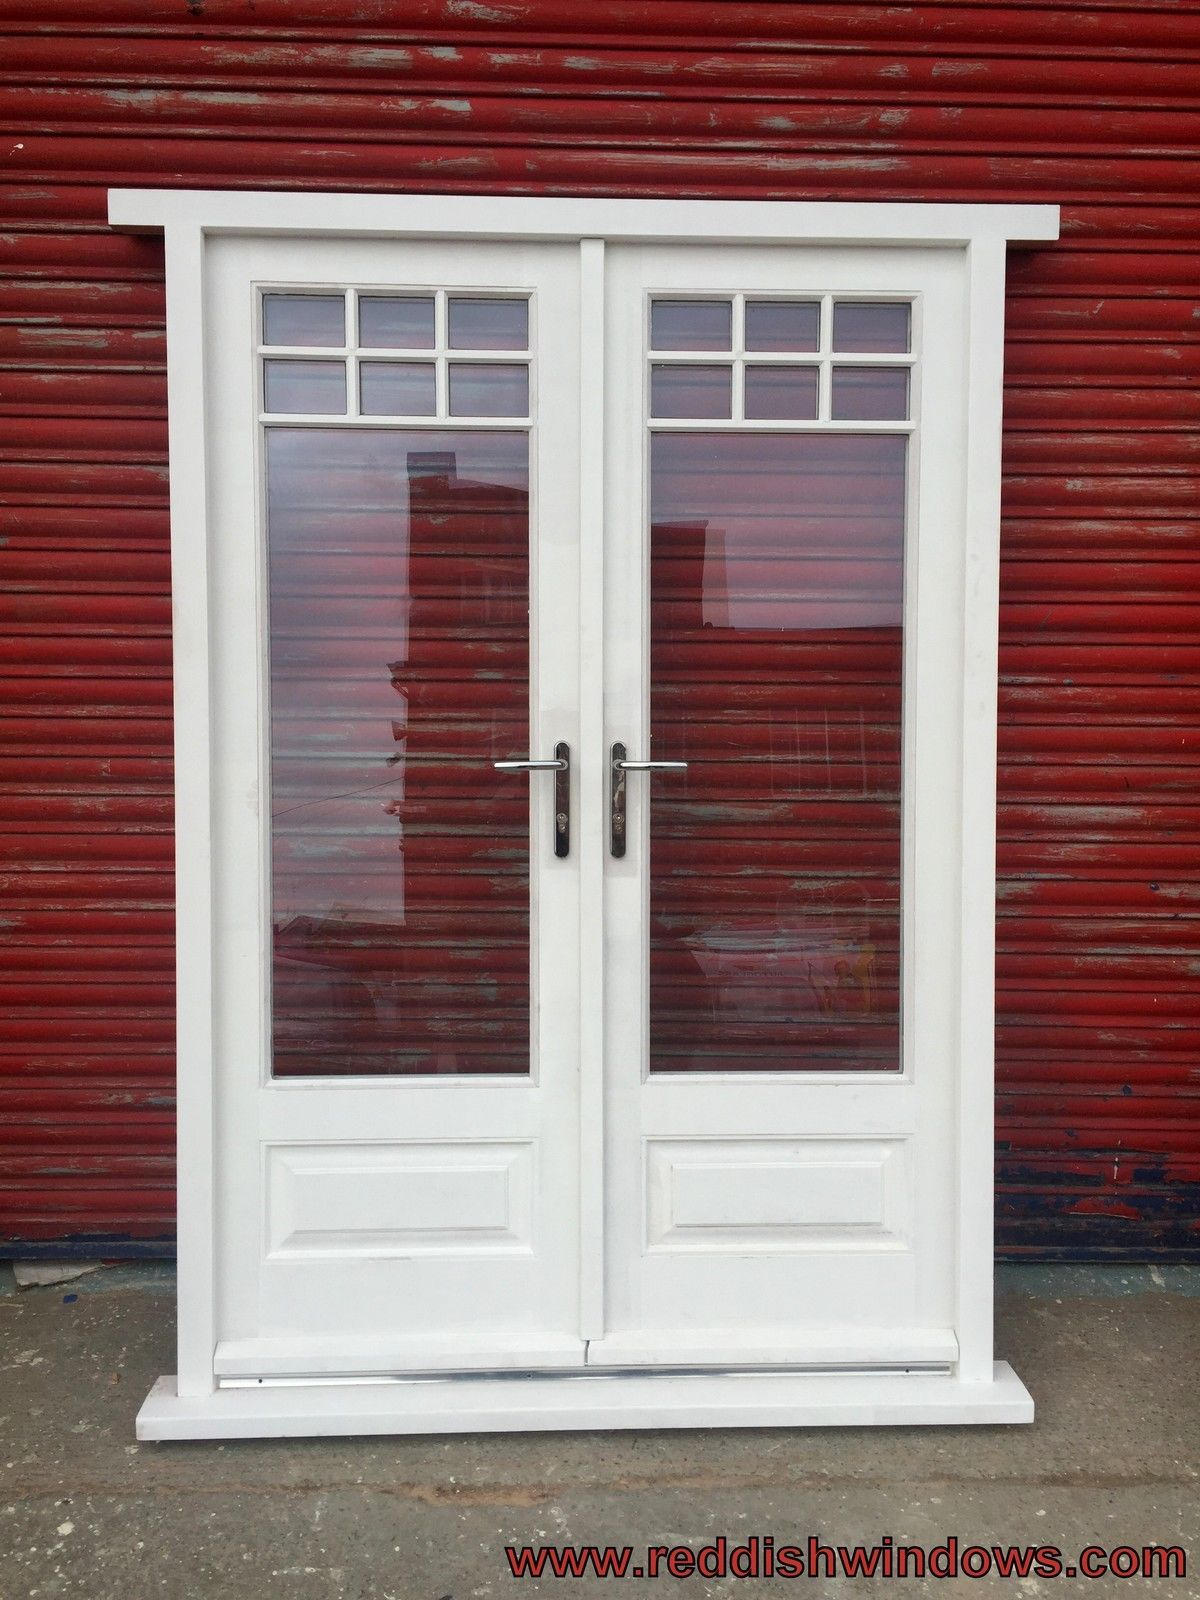 Hardwood Timber French Doors With Astragal Glazing Bars Bespoke Made